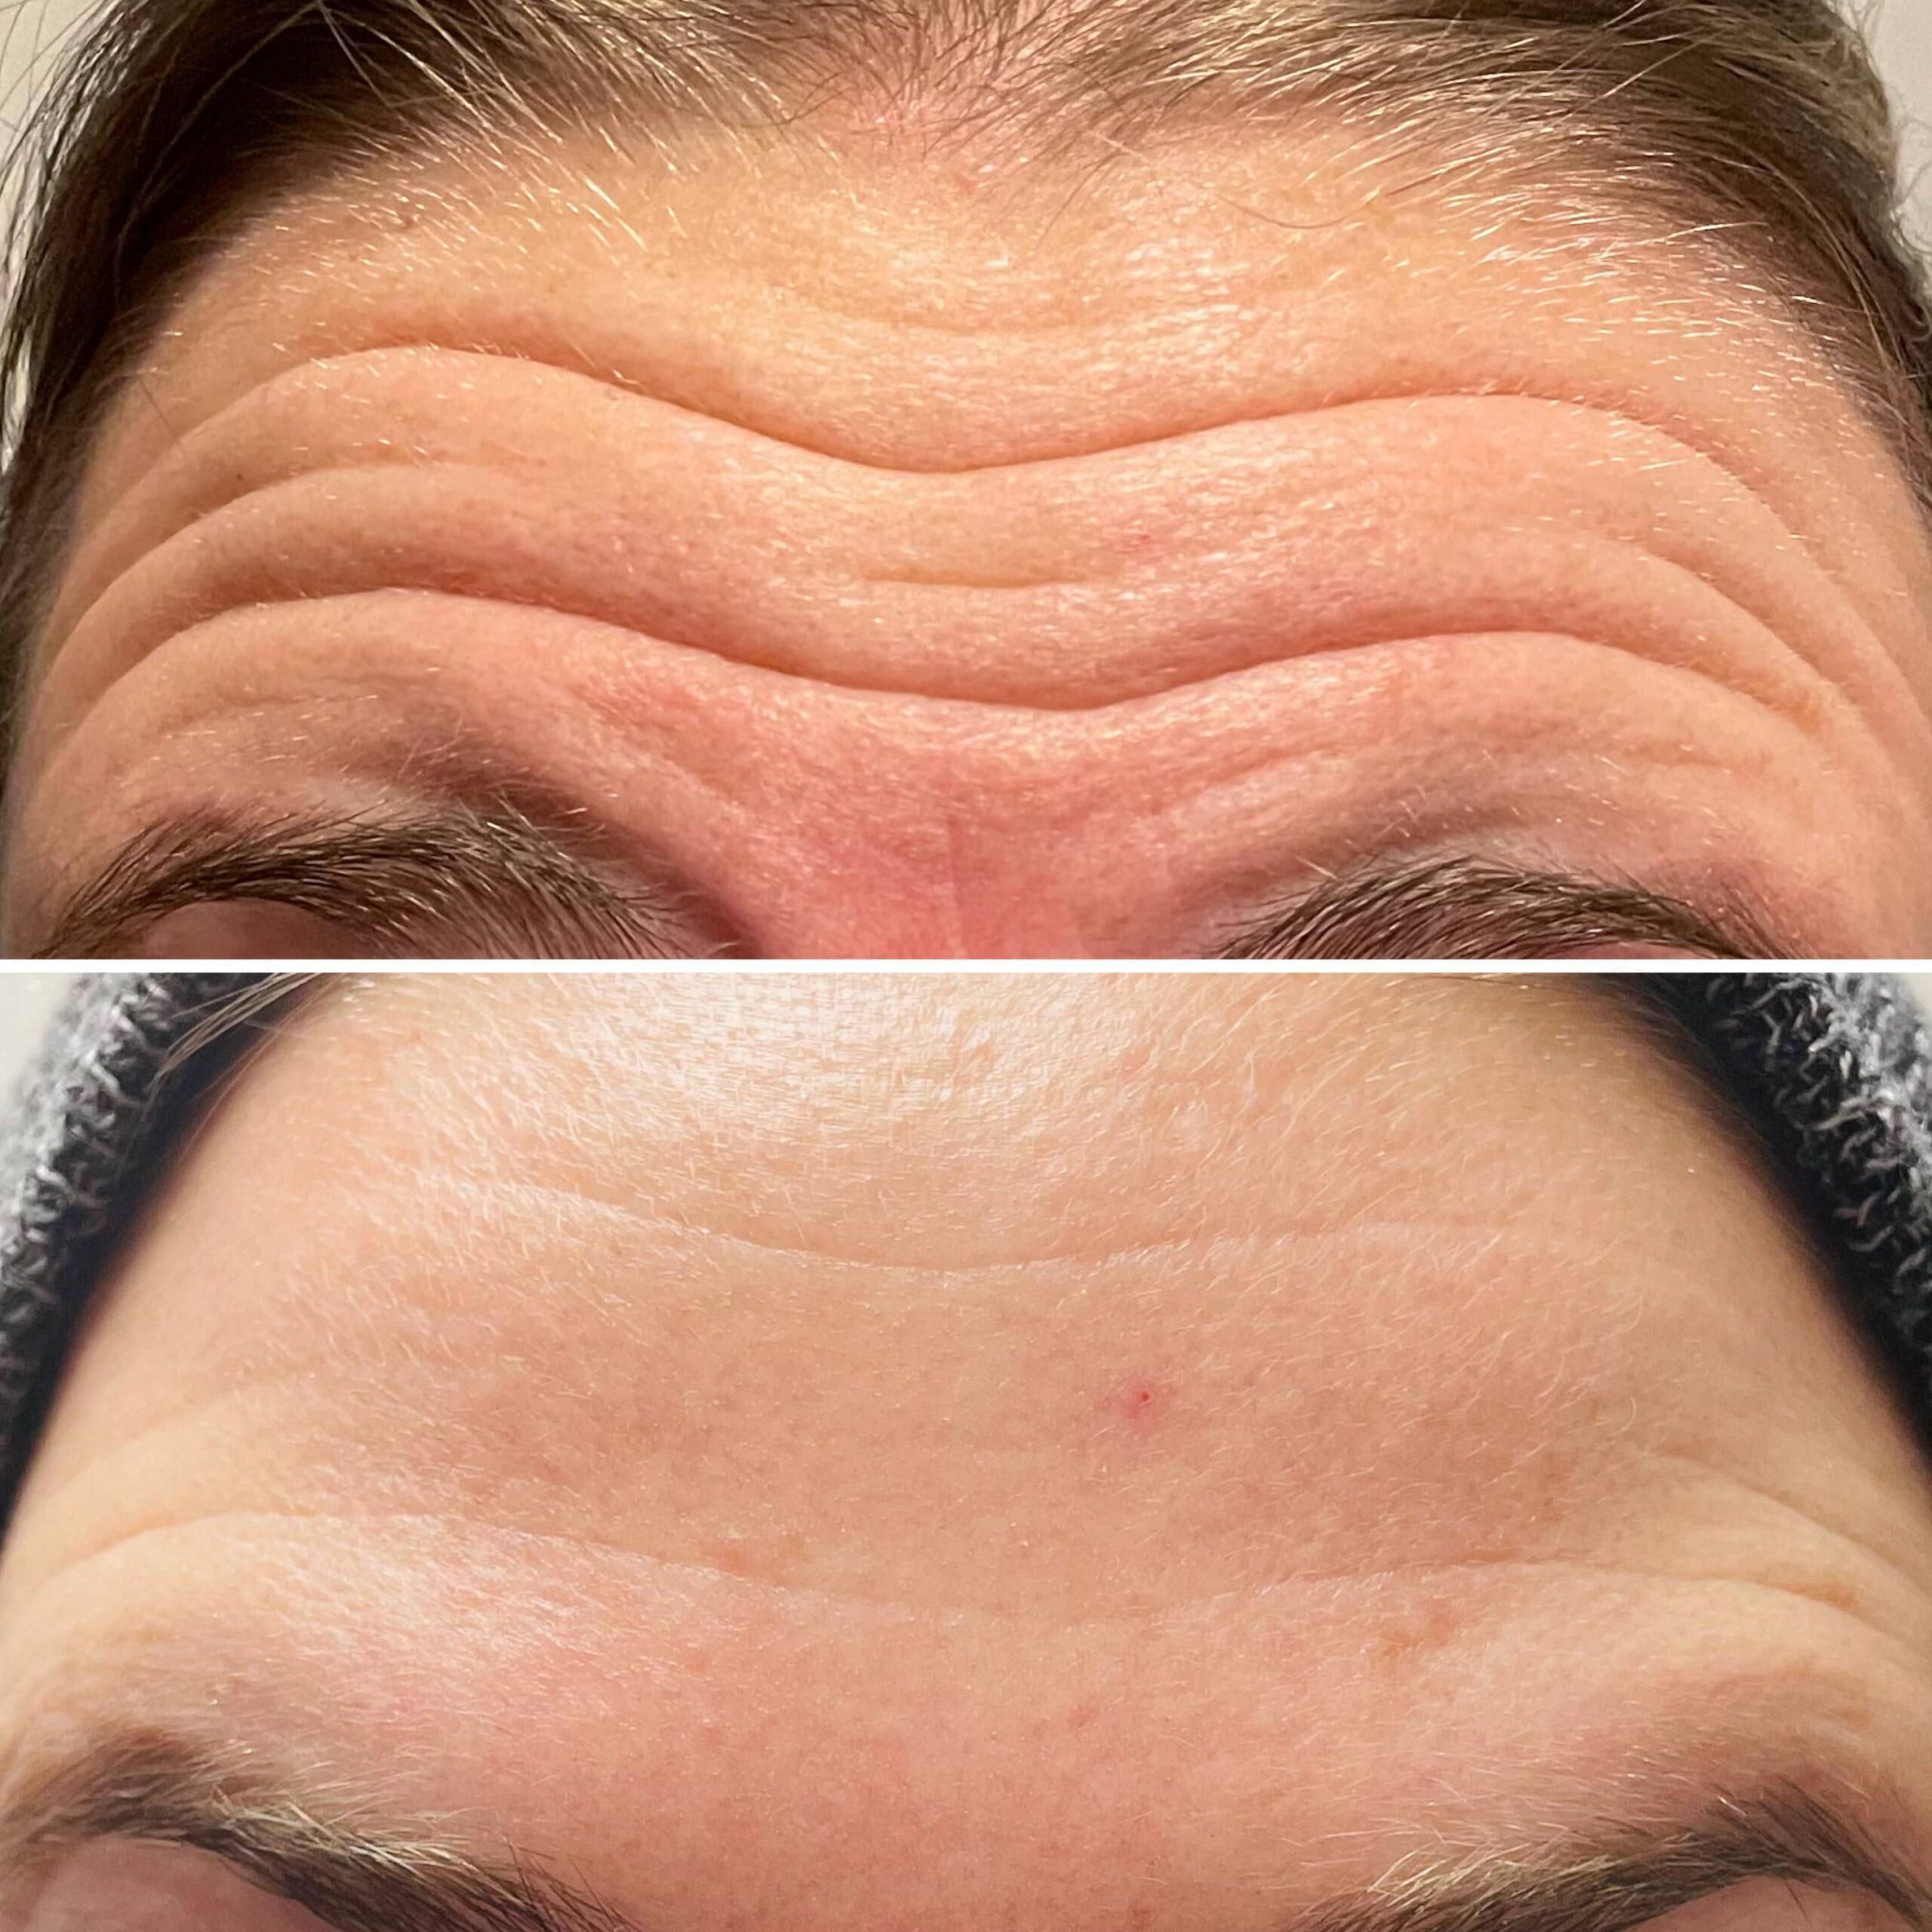 beauty cosmetic injectors dysport botox injections ottawa ontario